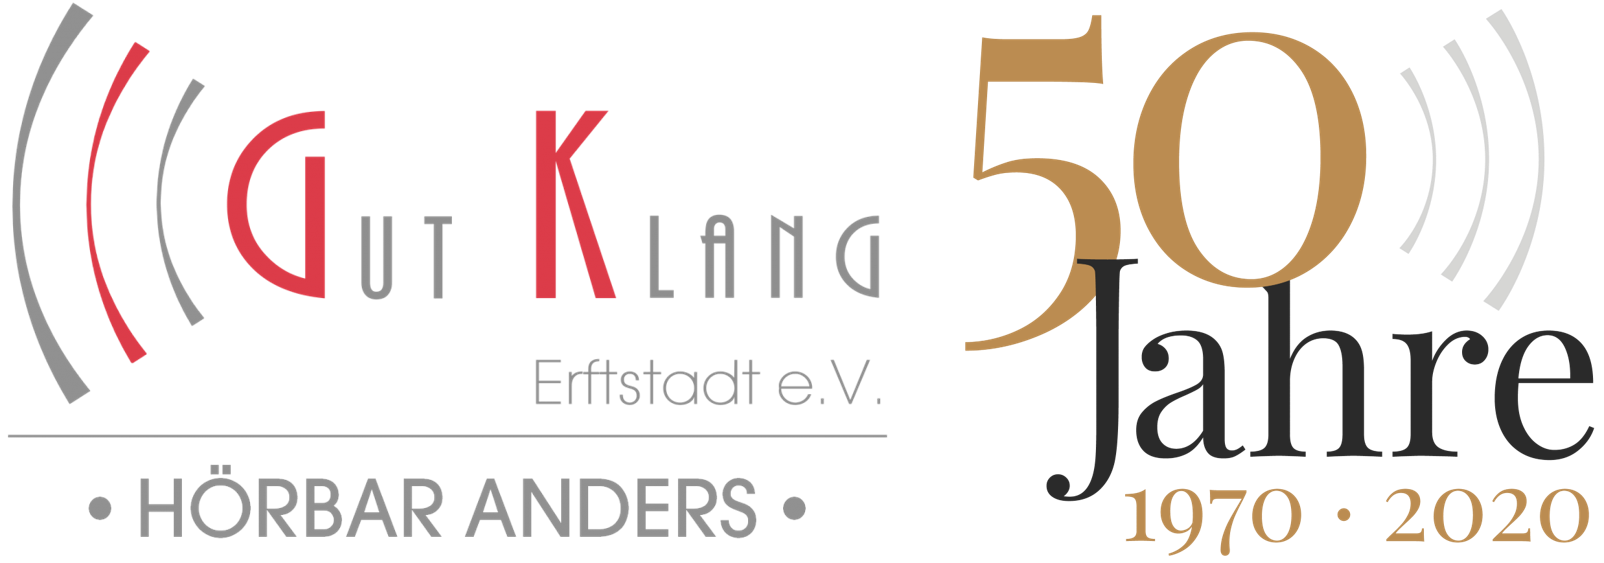 Gut Klang Erftstadt e.V.